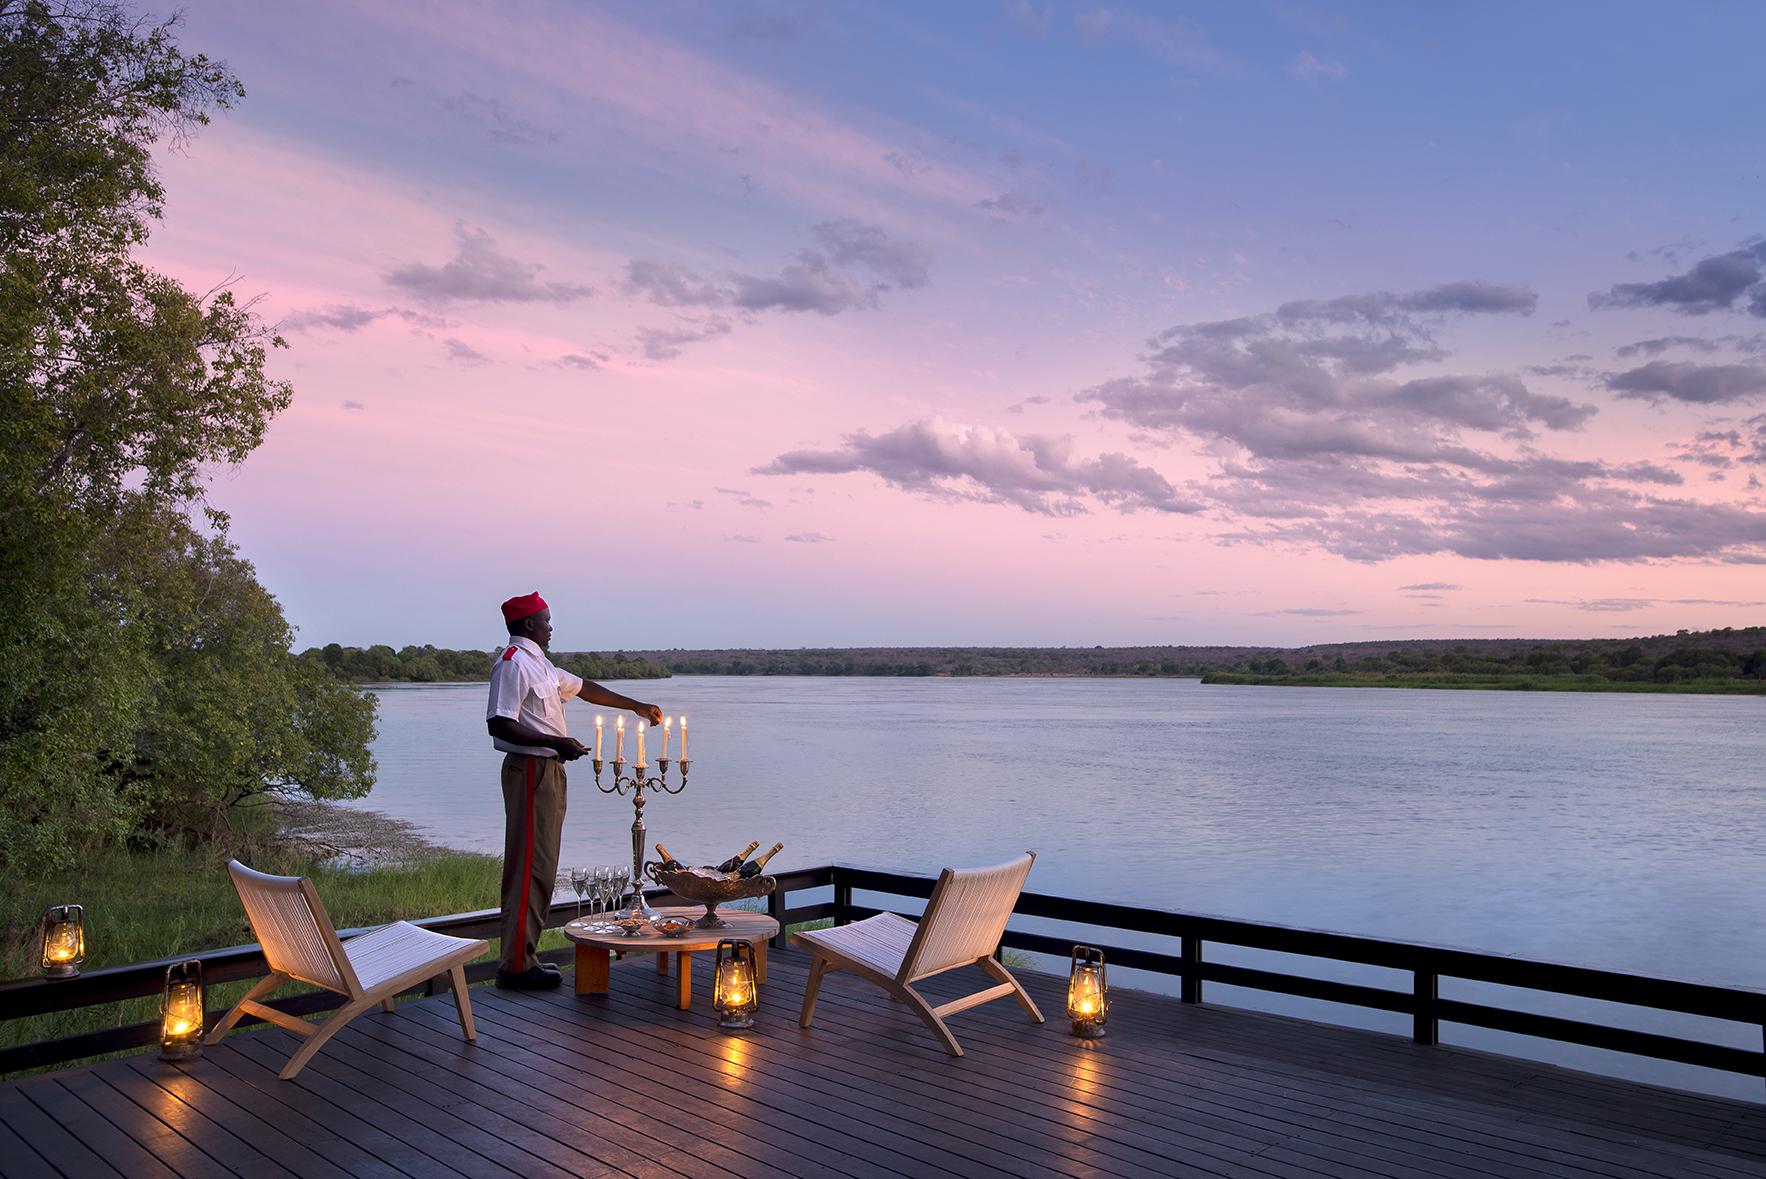 Royal_chundu_Zambezi River candlelit diner on river